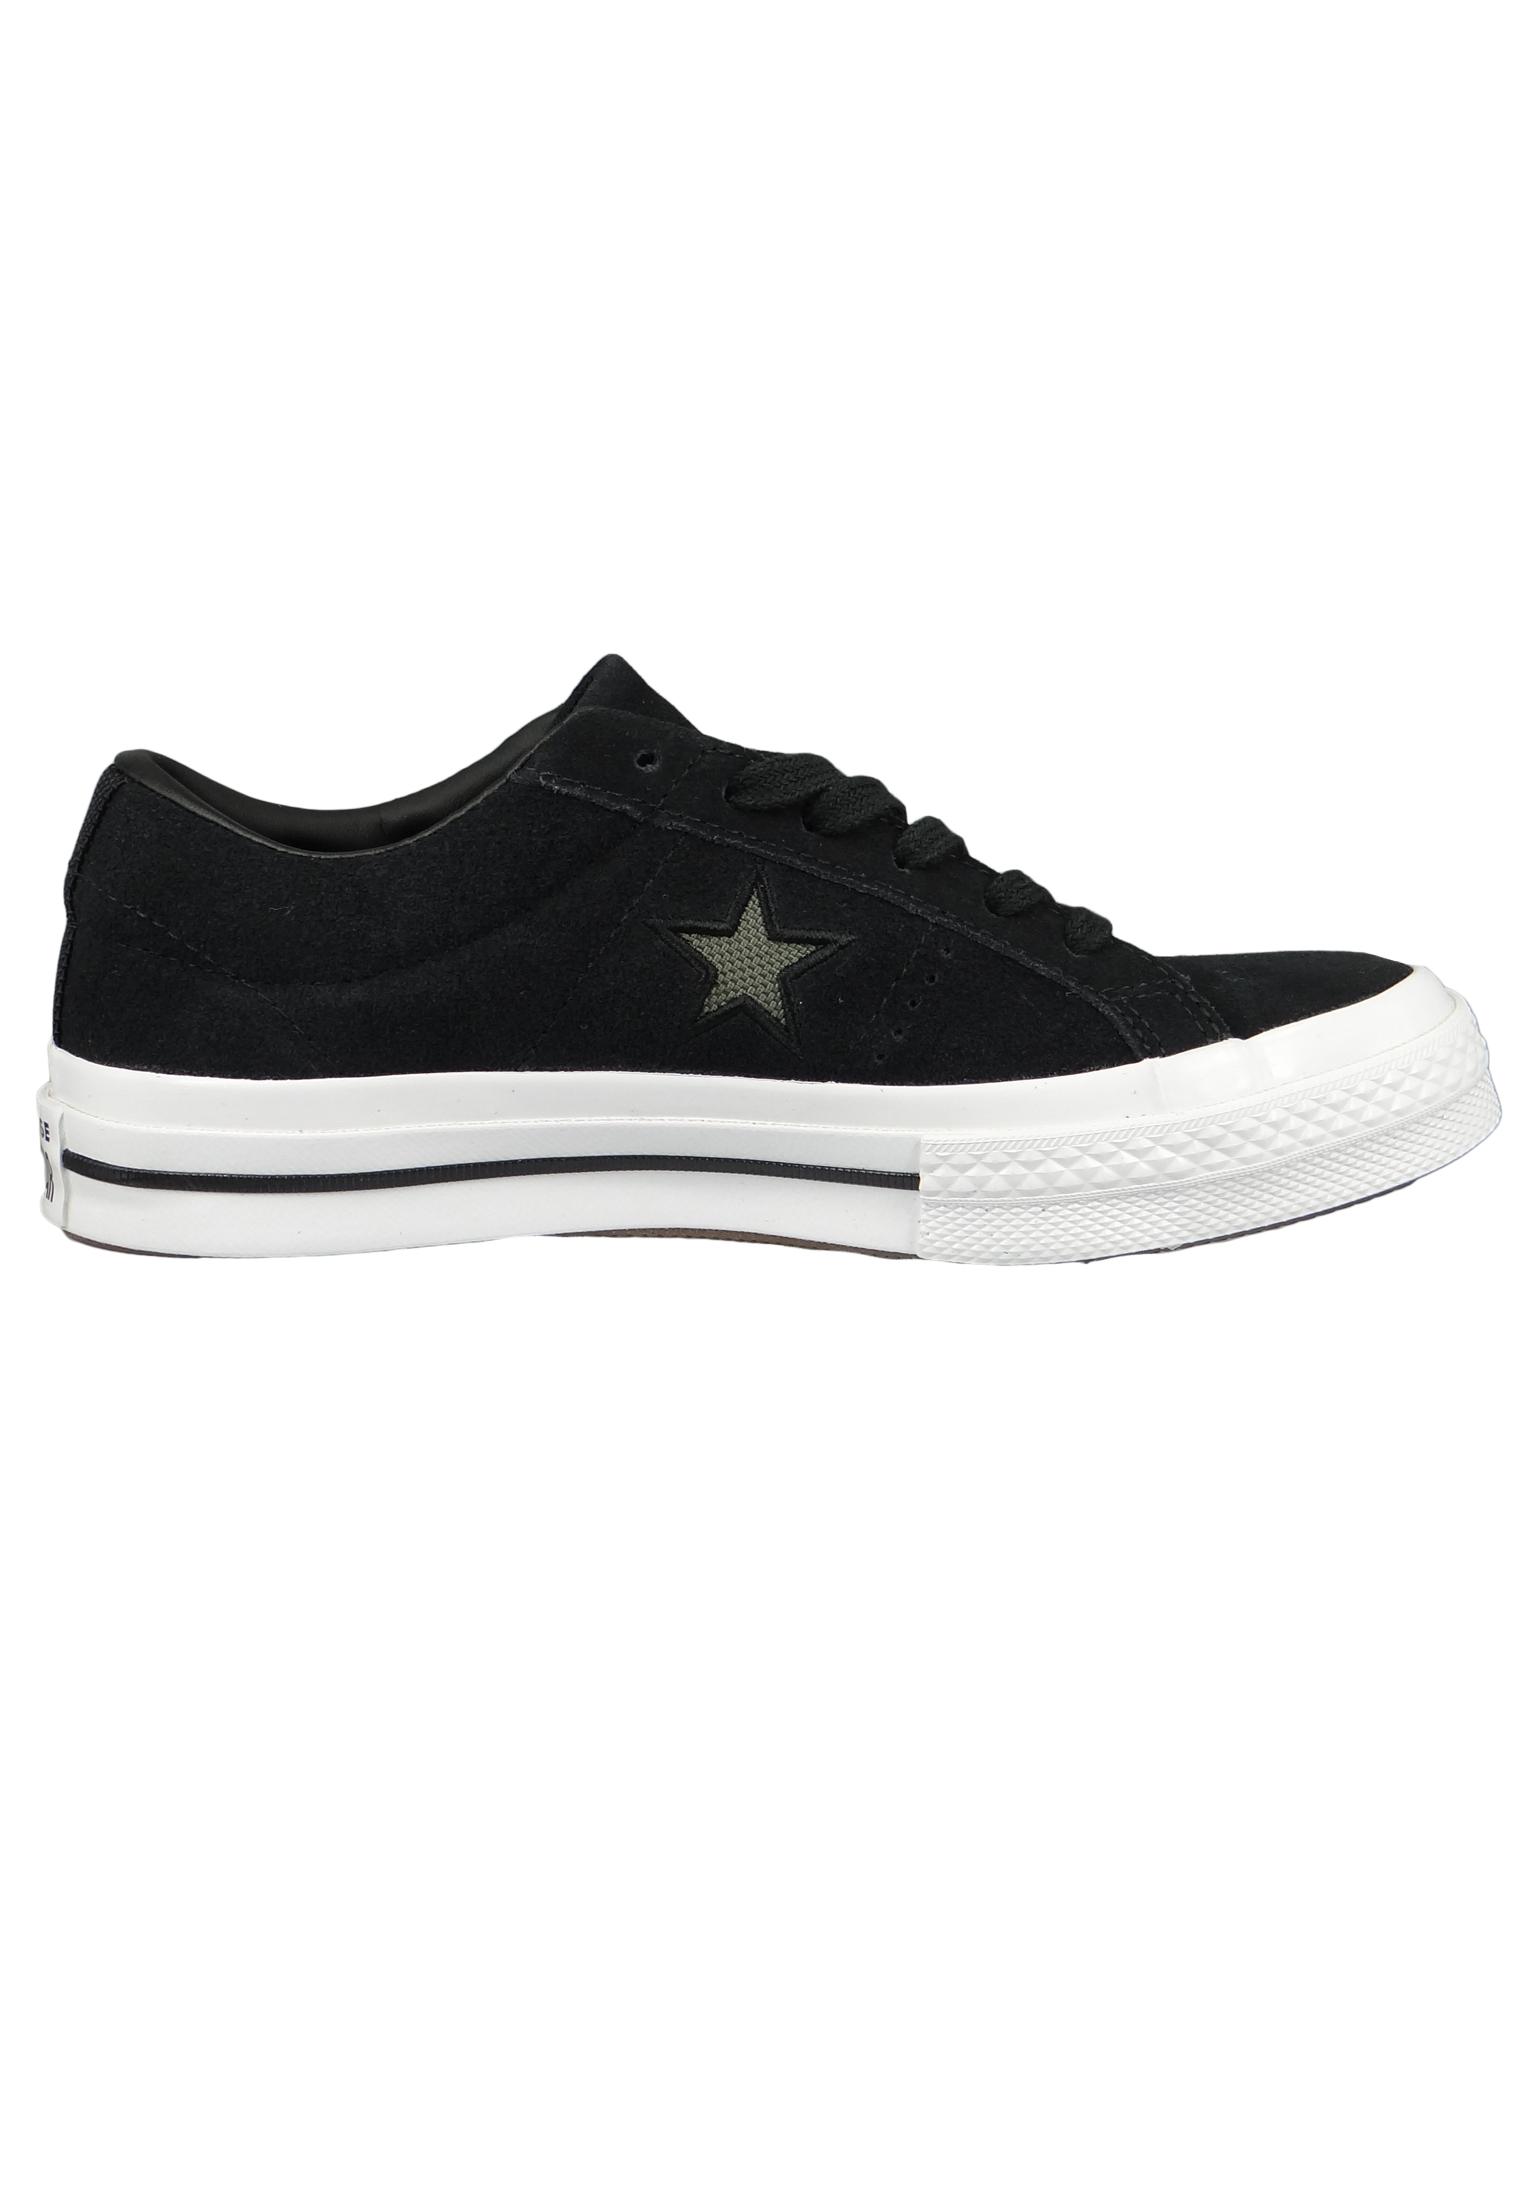 Converse Chucks 163383C Schwarz One Star OX Black Field